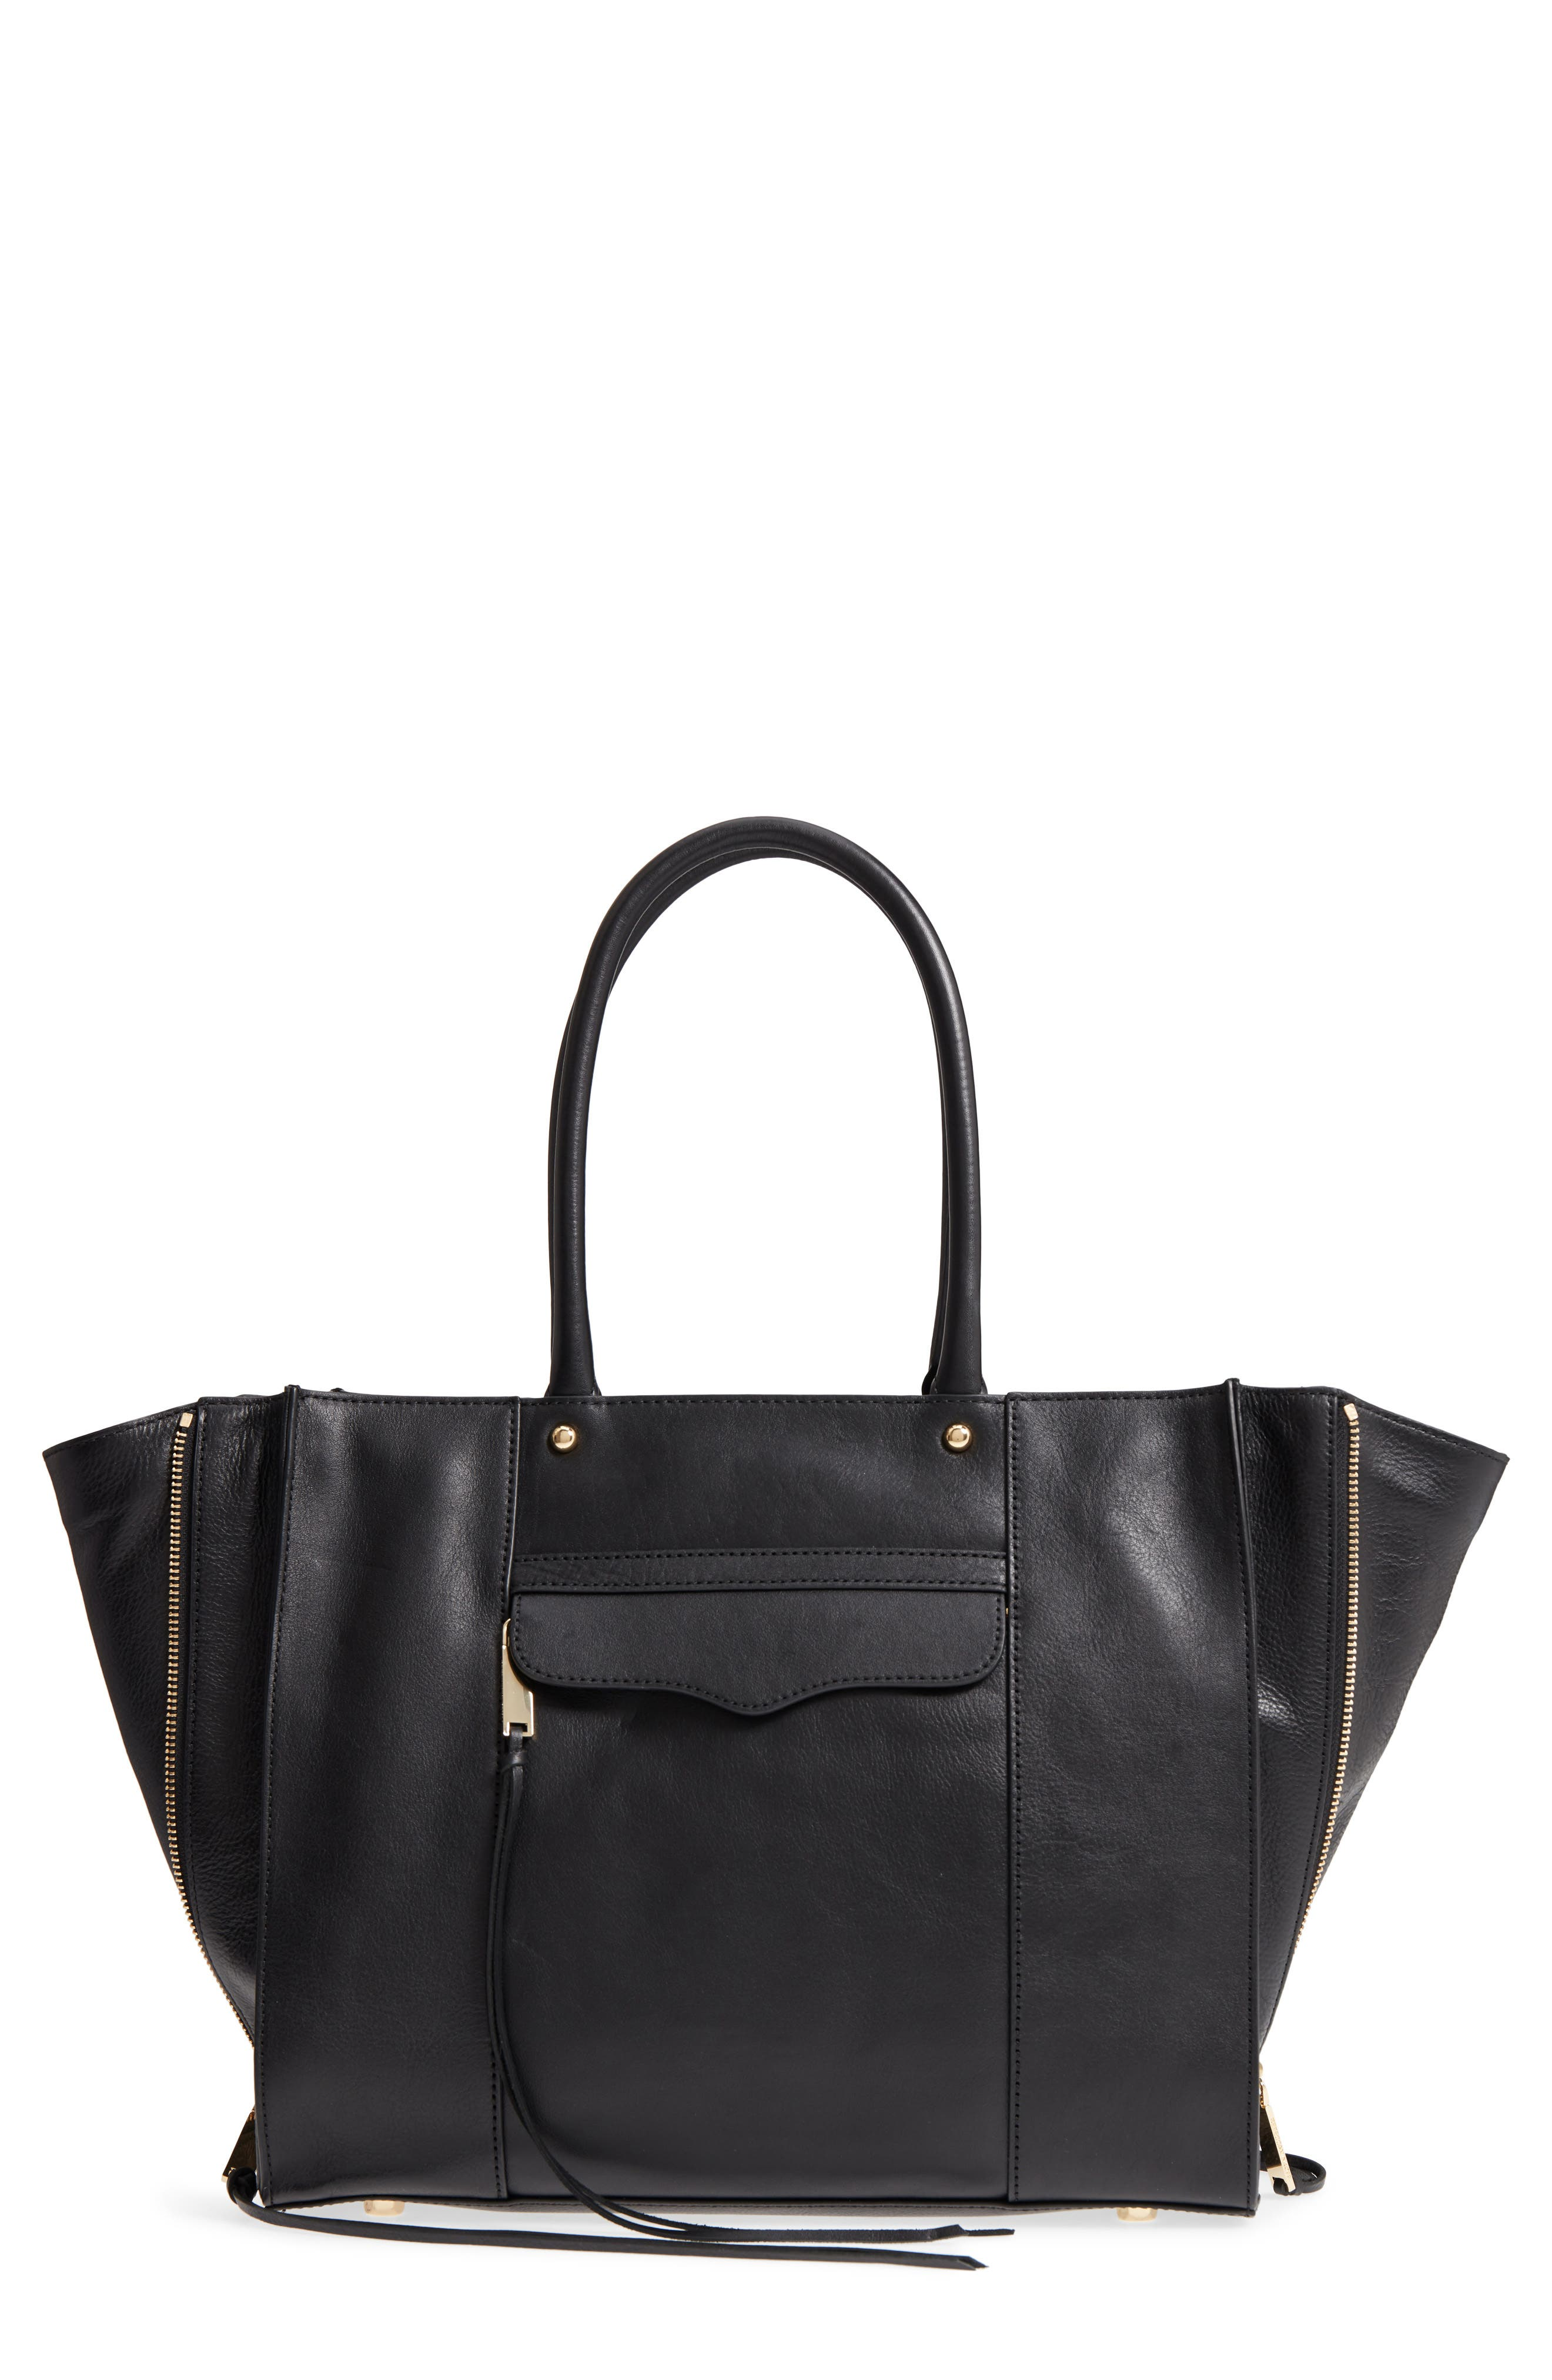 Rebecca Minkoff Medium MAB Leather Tote